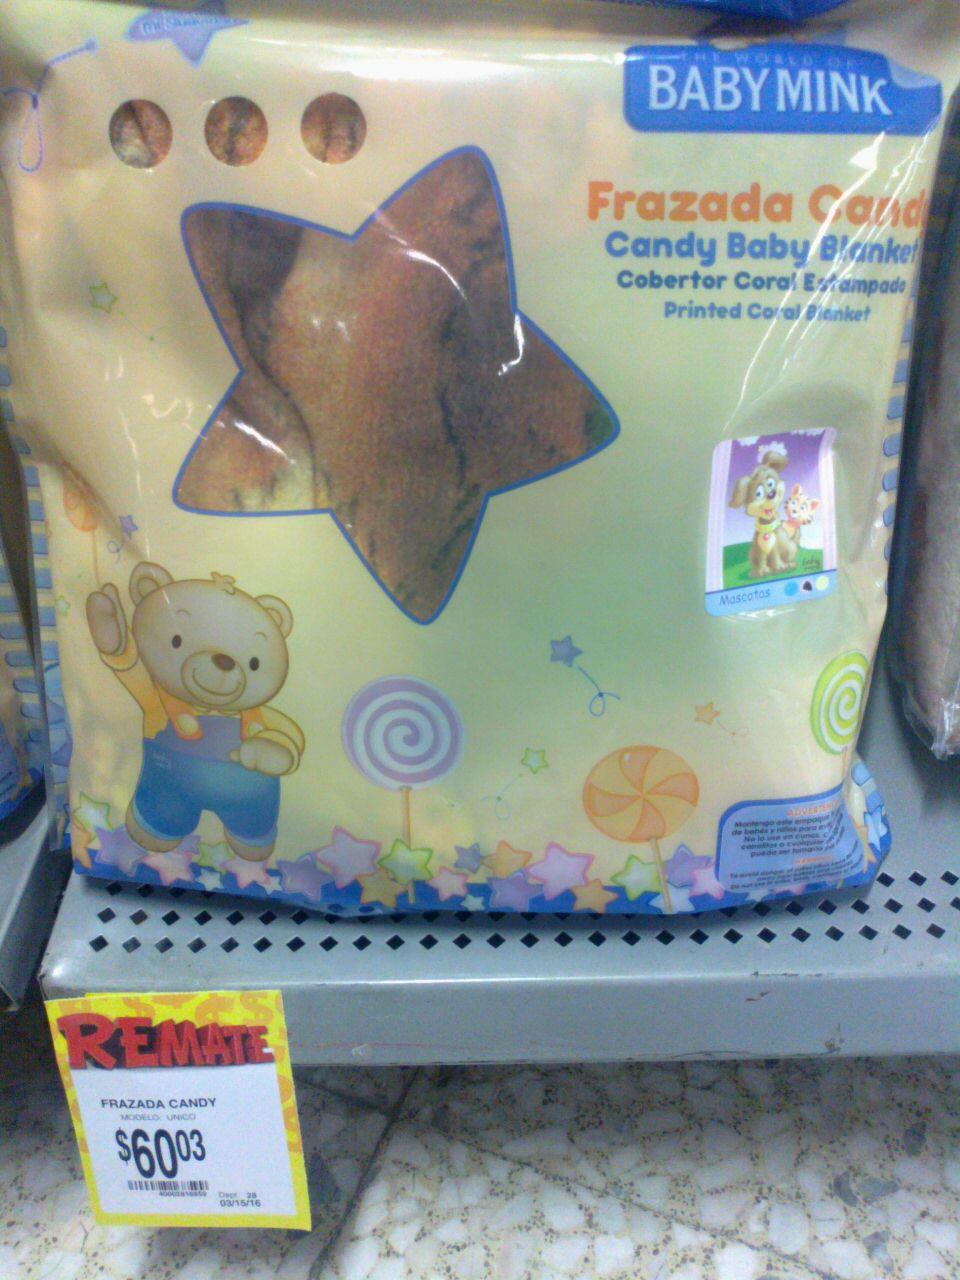 Bodega Aurrerá: Frazada Baby Mink a $60.03